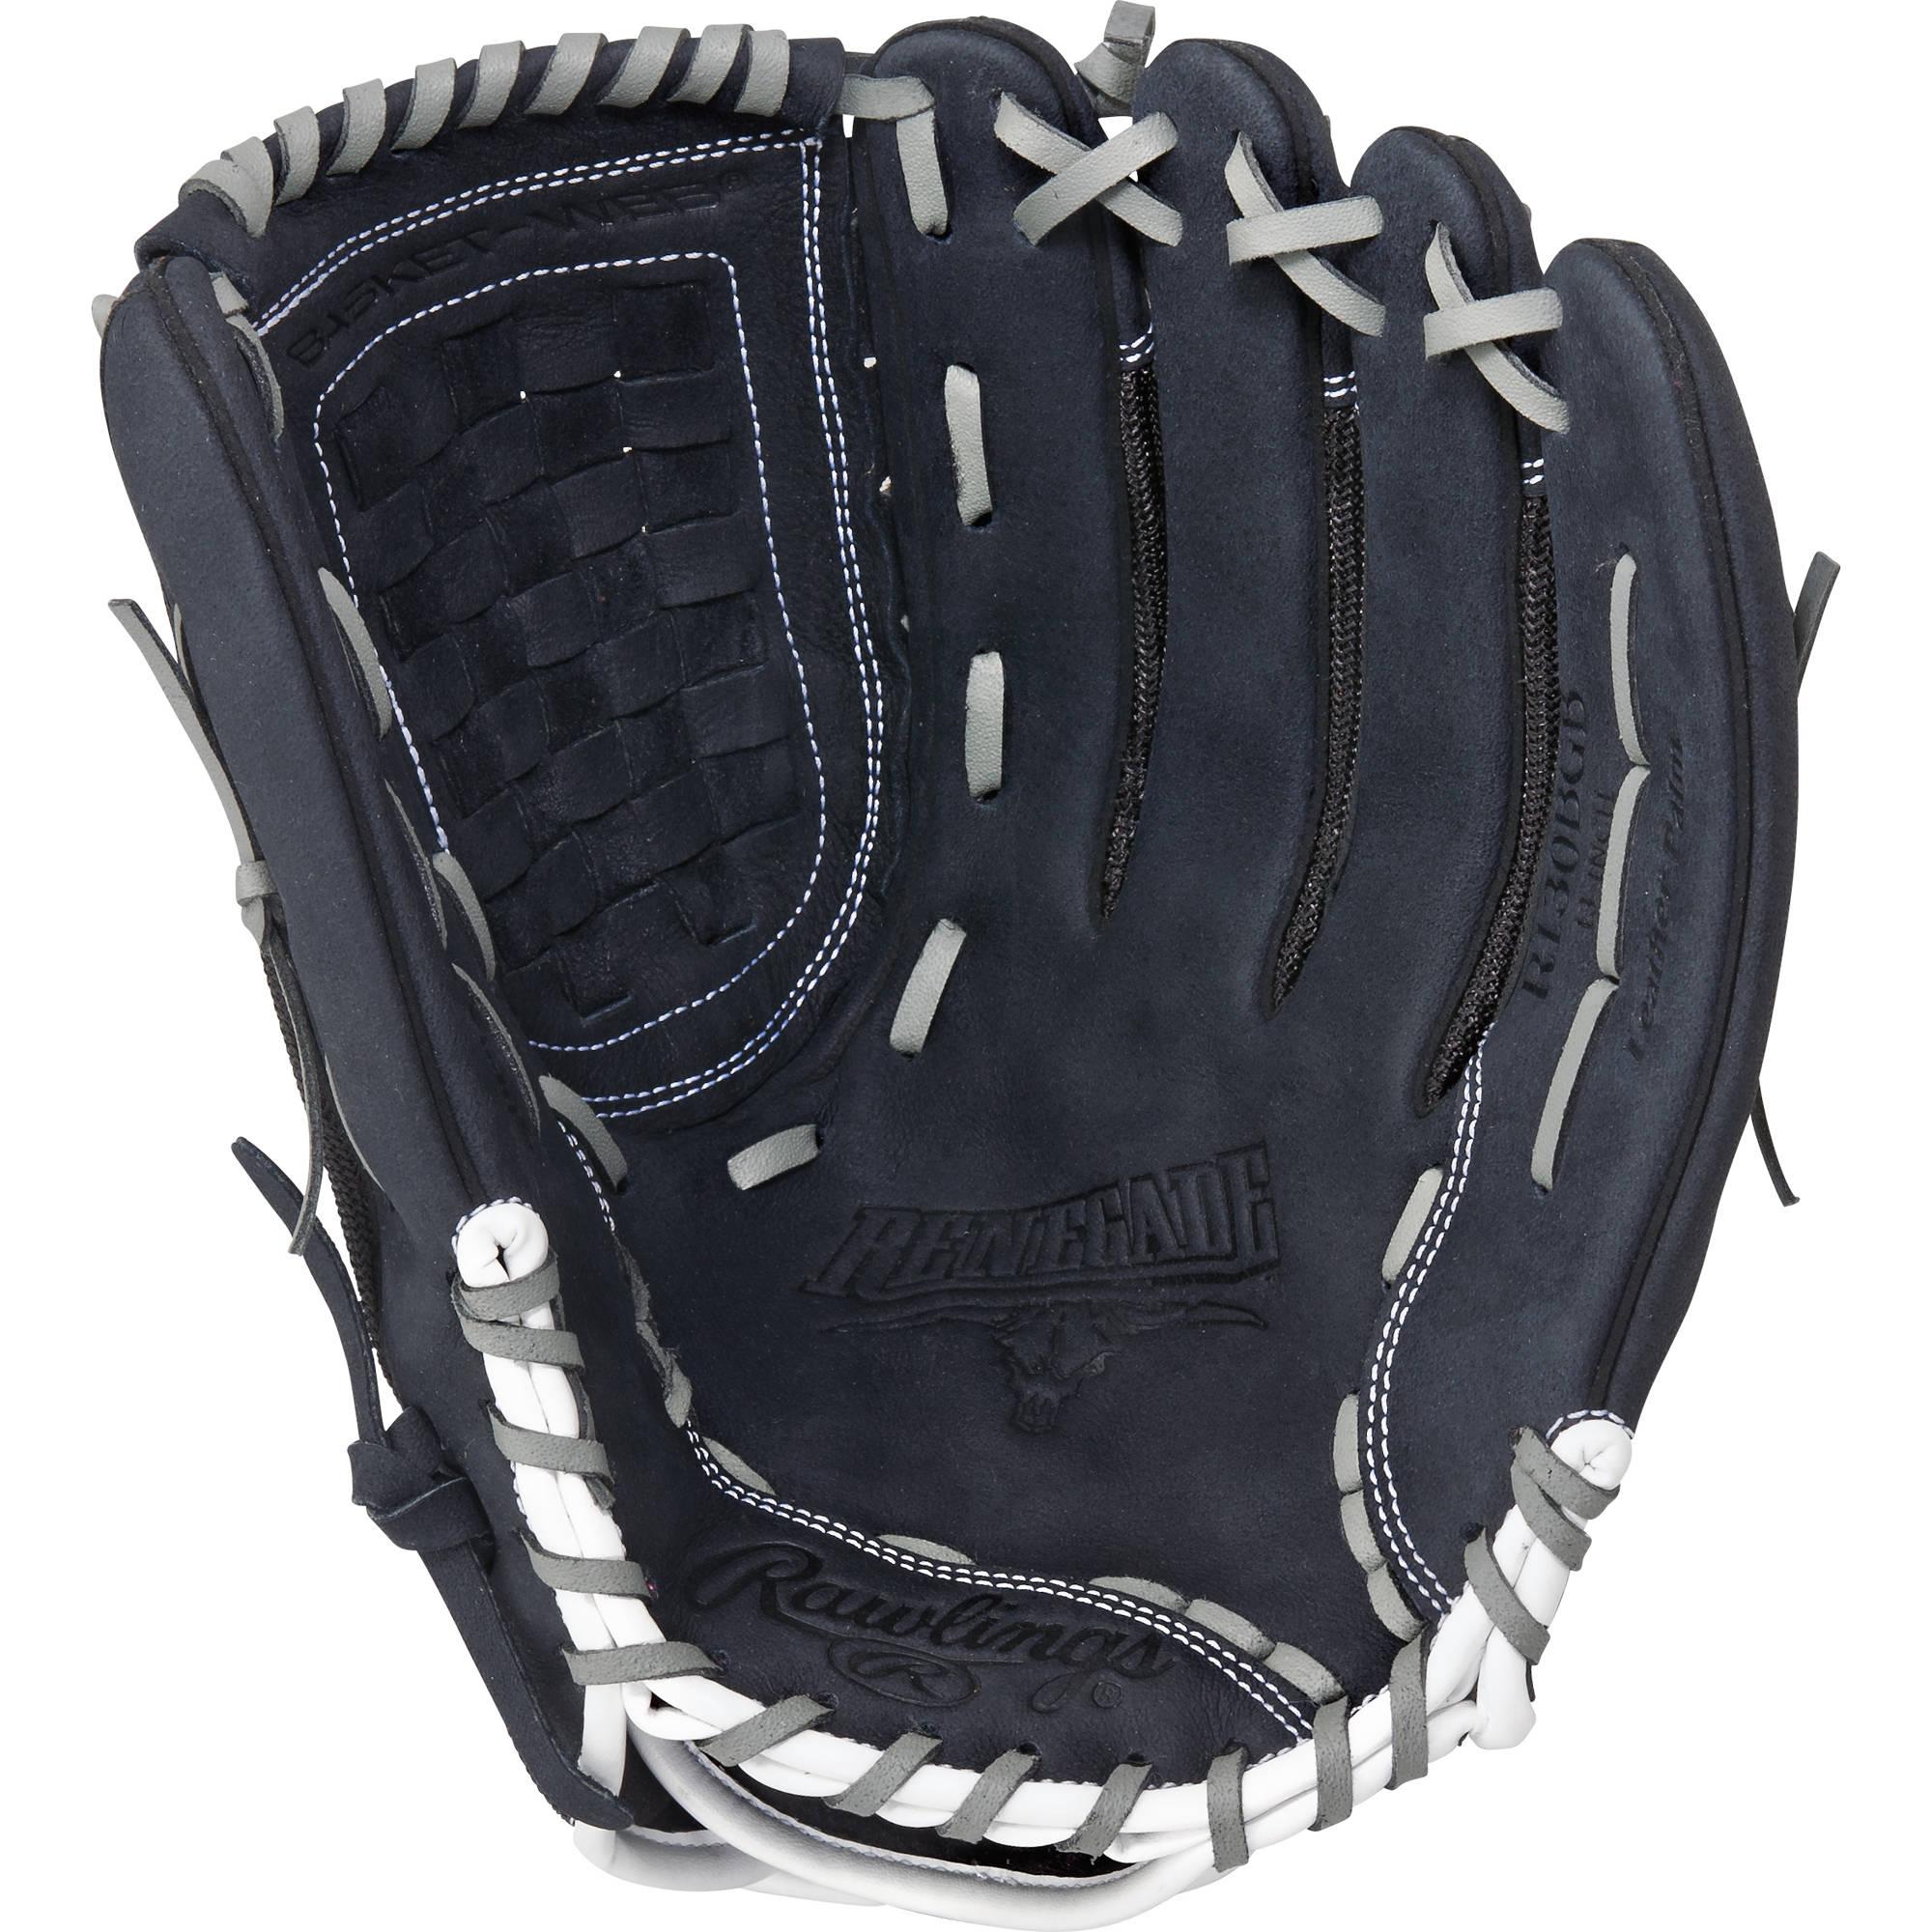 "Rawlings 13"" Renegade Series Glove, Basket Web, Left Hand Throwing"